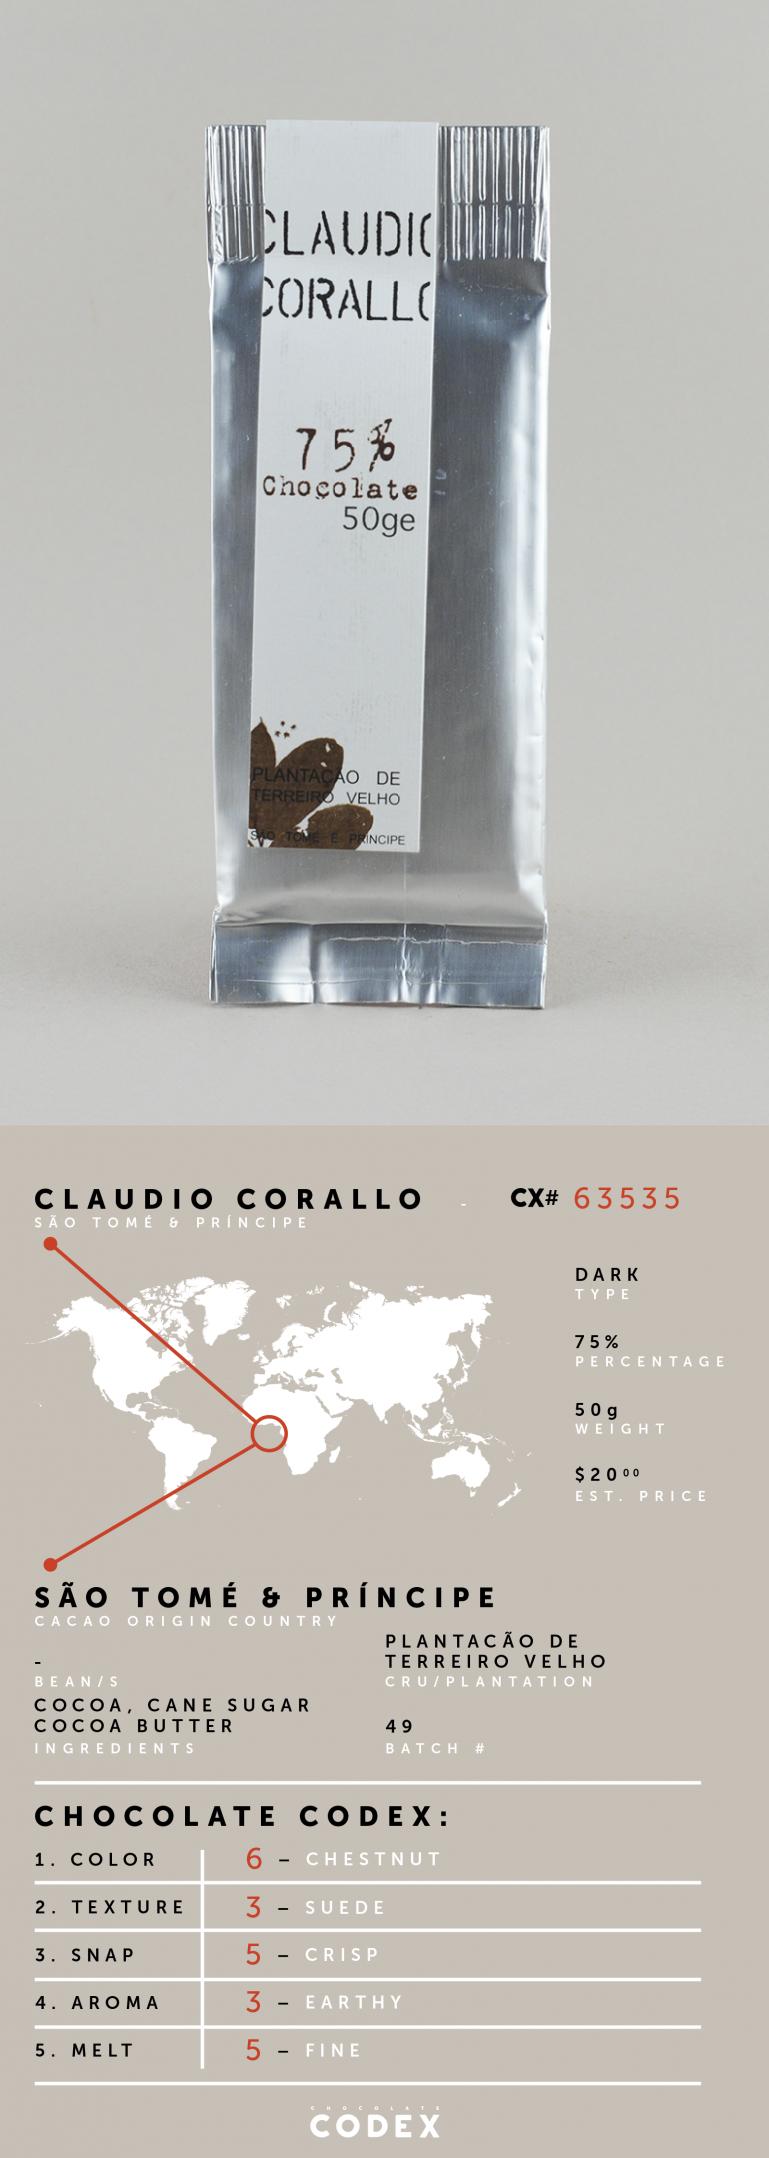 Chocolate_Codex_Claudio_Corallo_SaoTome_75